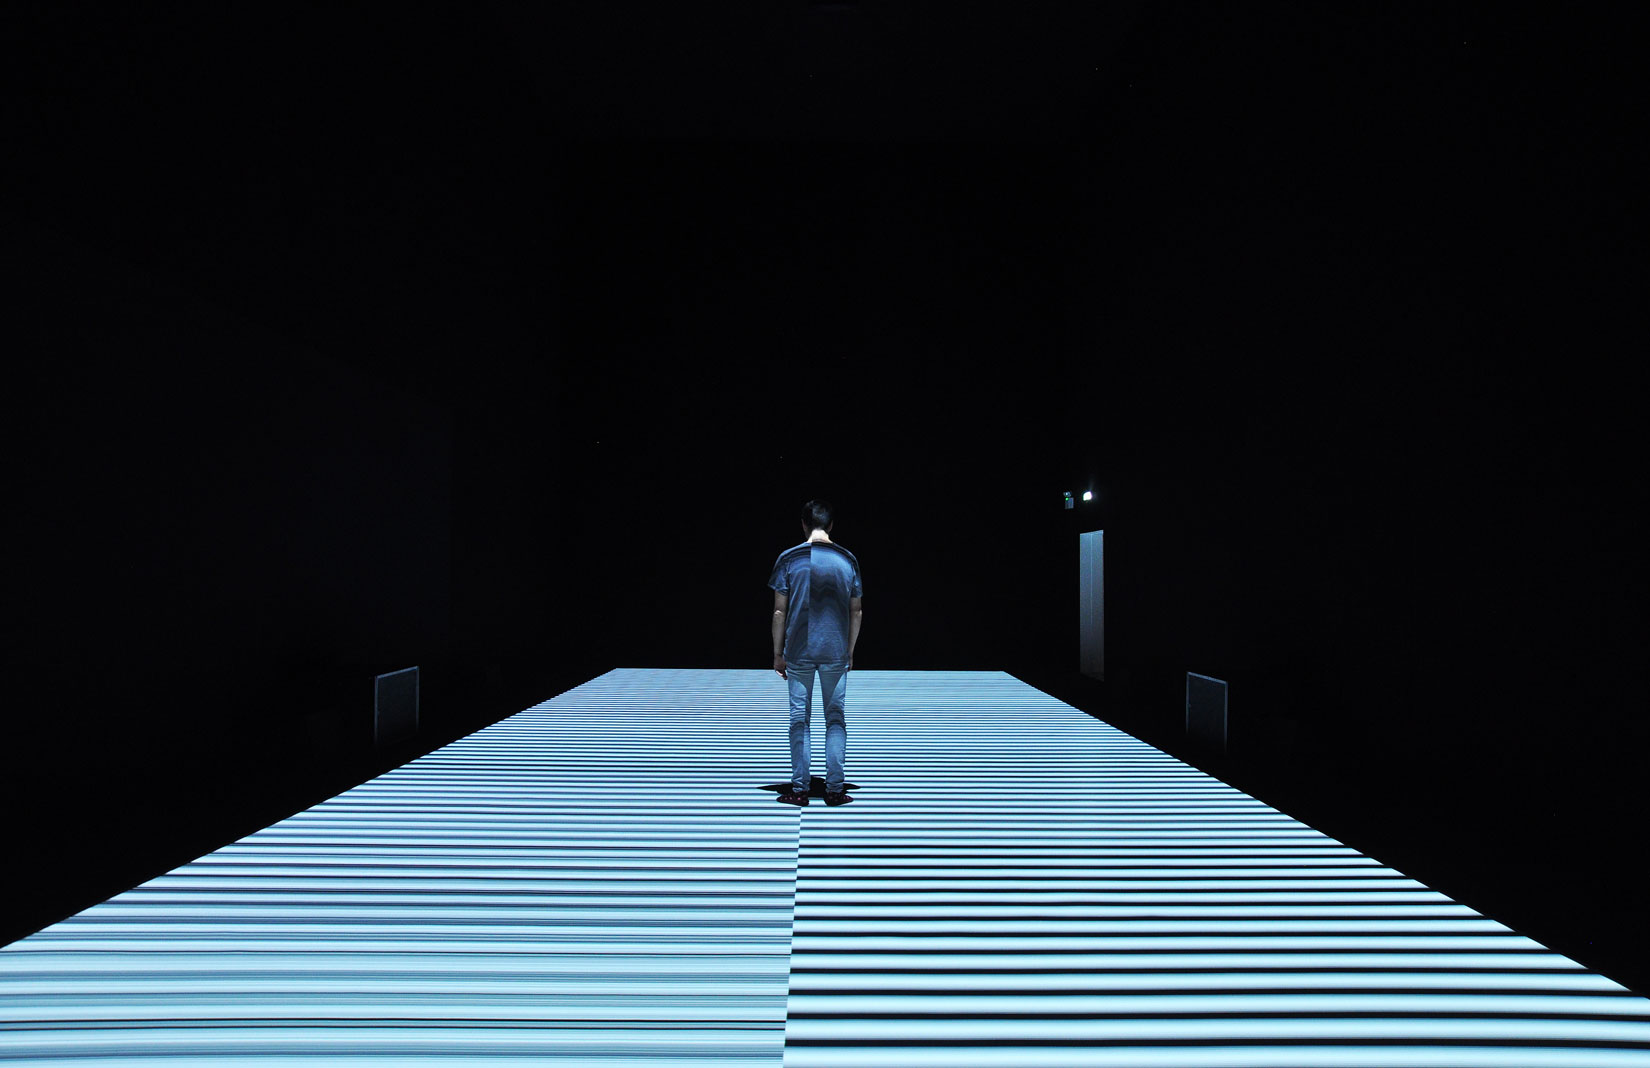 Ryoji Ikeda, 'test pattern no 12', site specific installation 2017. (c) Ryoji Ikeda. Photography: Rosella Degori Courtesy of The Vinyl Factory